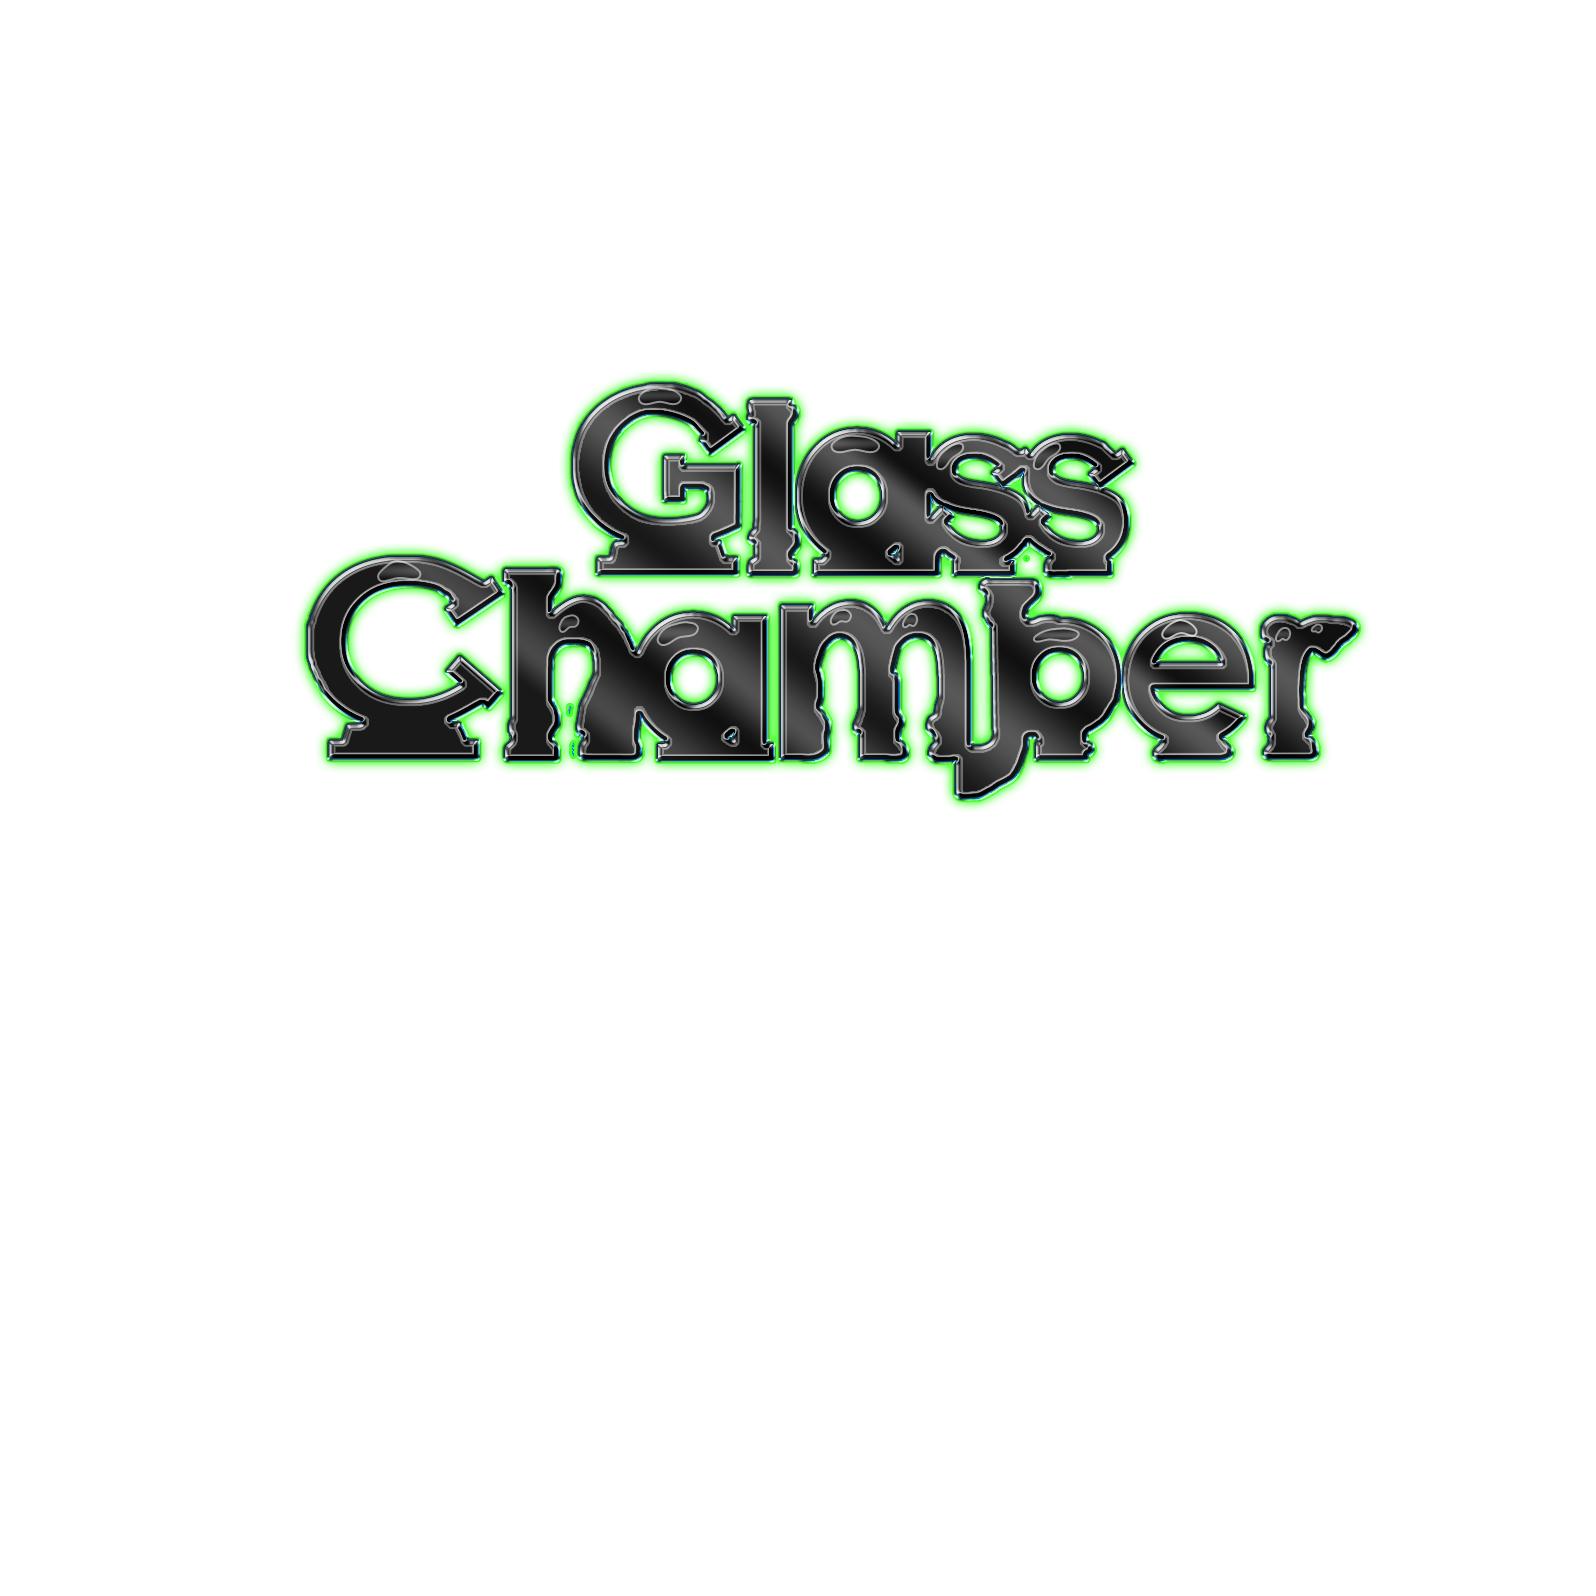 Glass Chamber